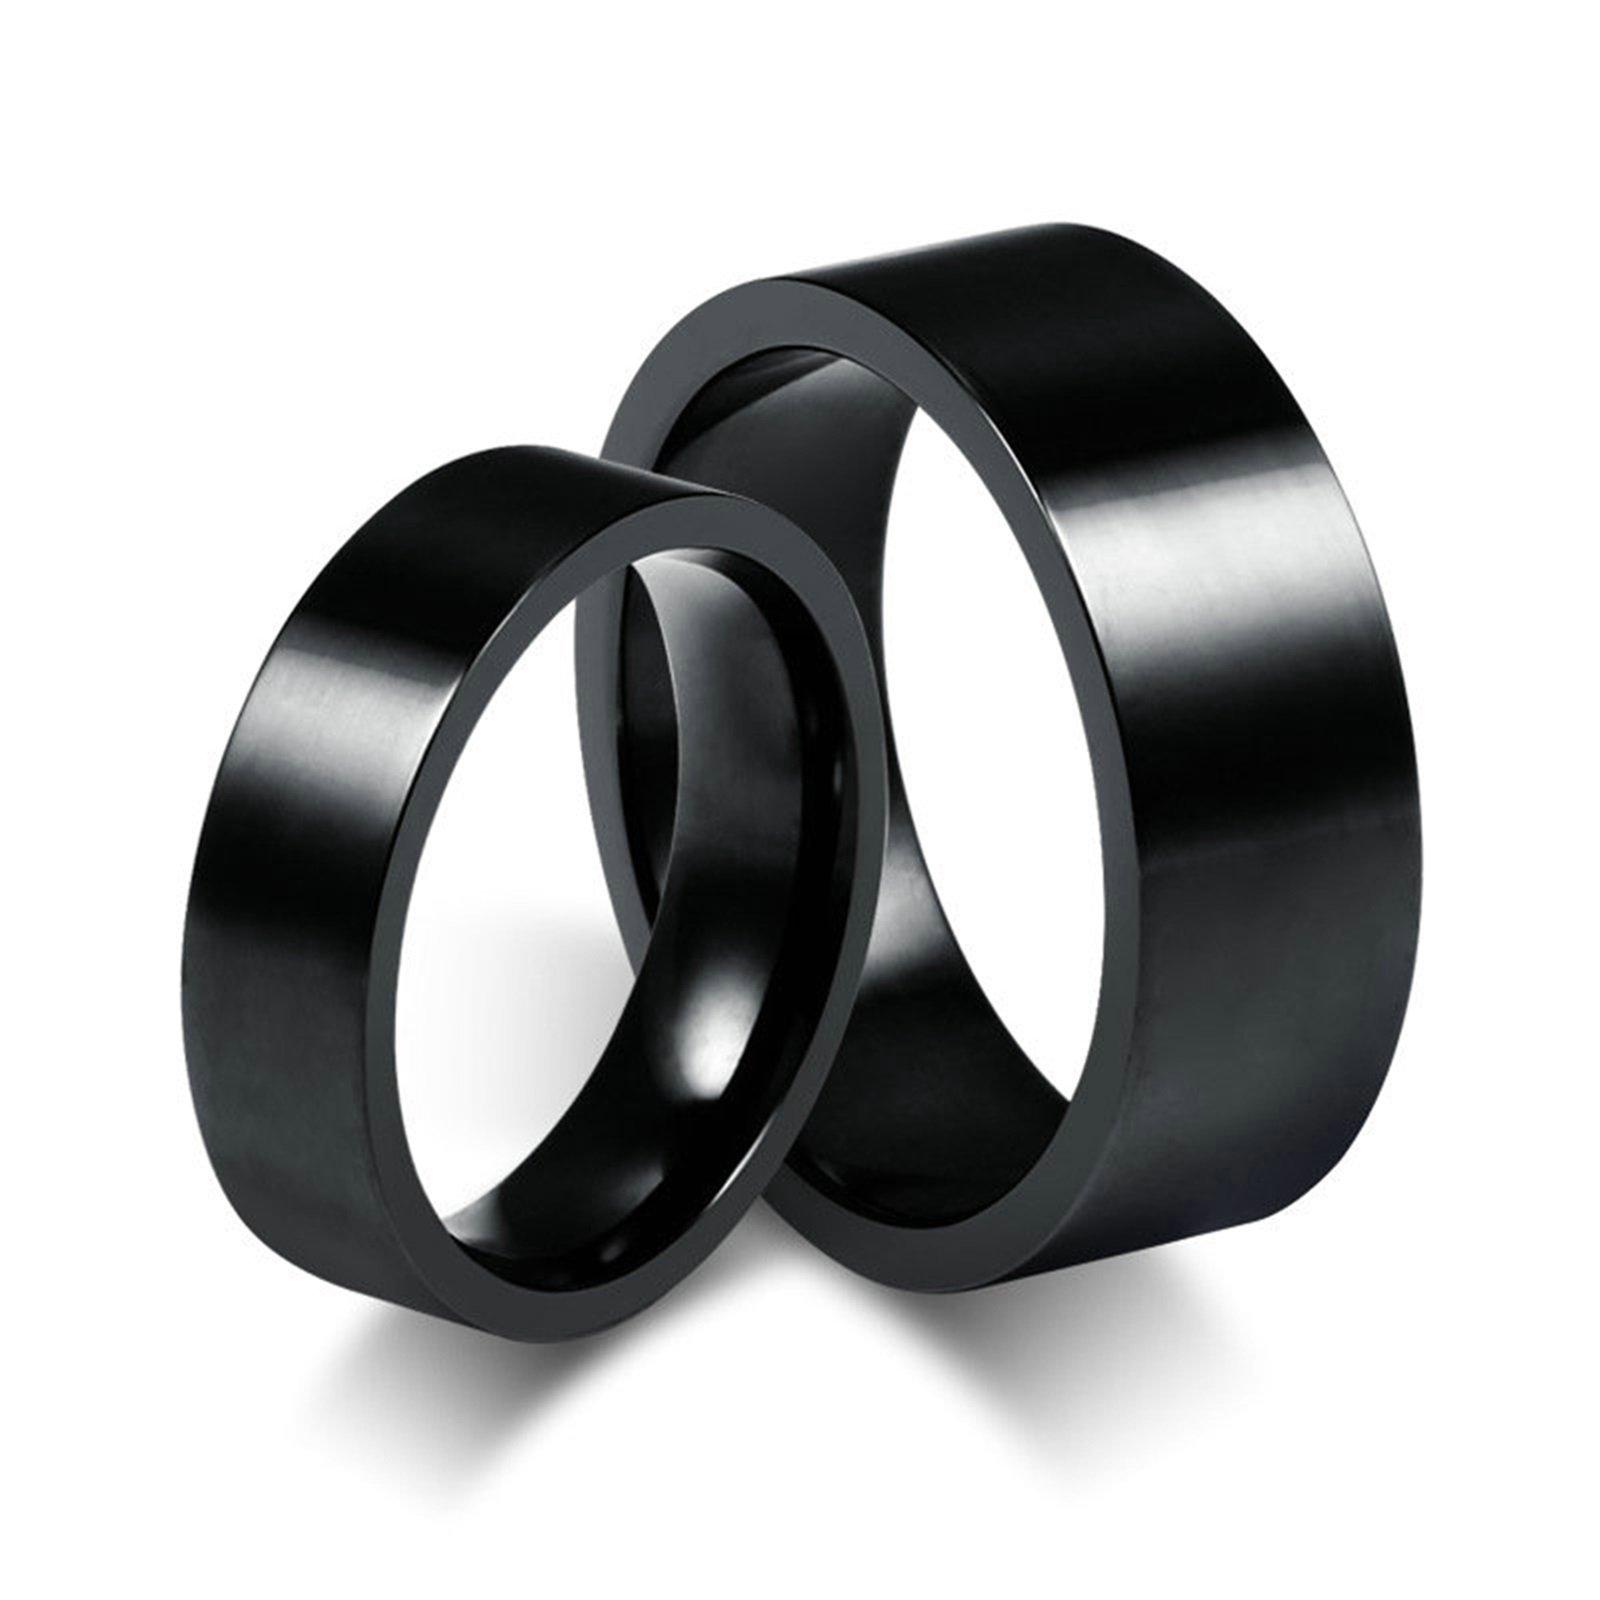 Beydodo 1PCS Stainless Steel Ring 10 Round 8MM Width Wedding Rings Mens Love Ring Band by Beydodo